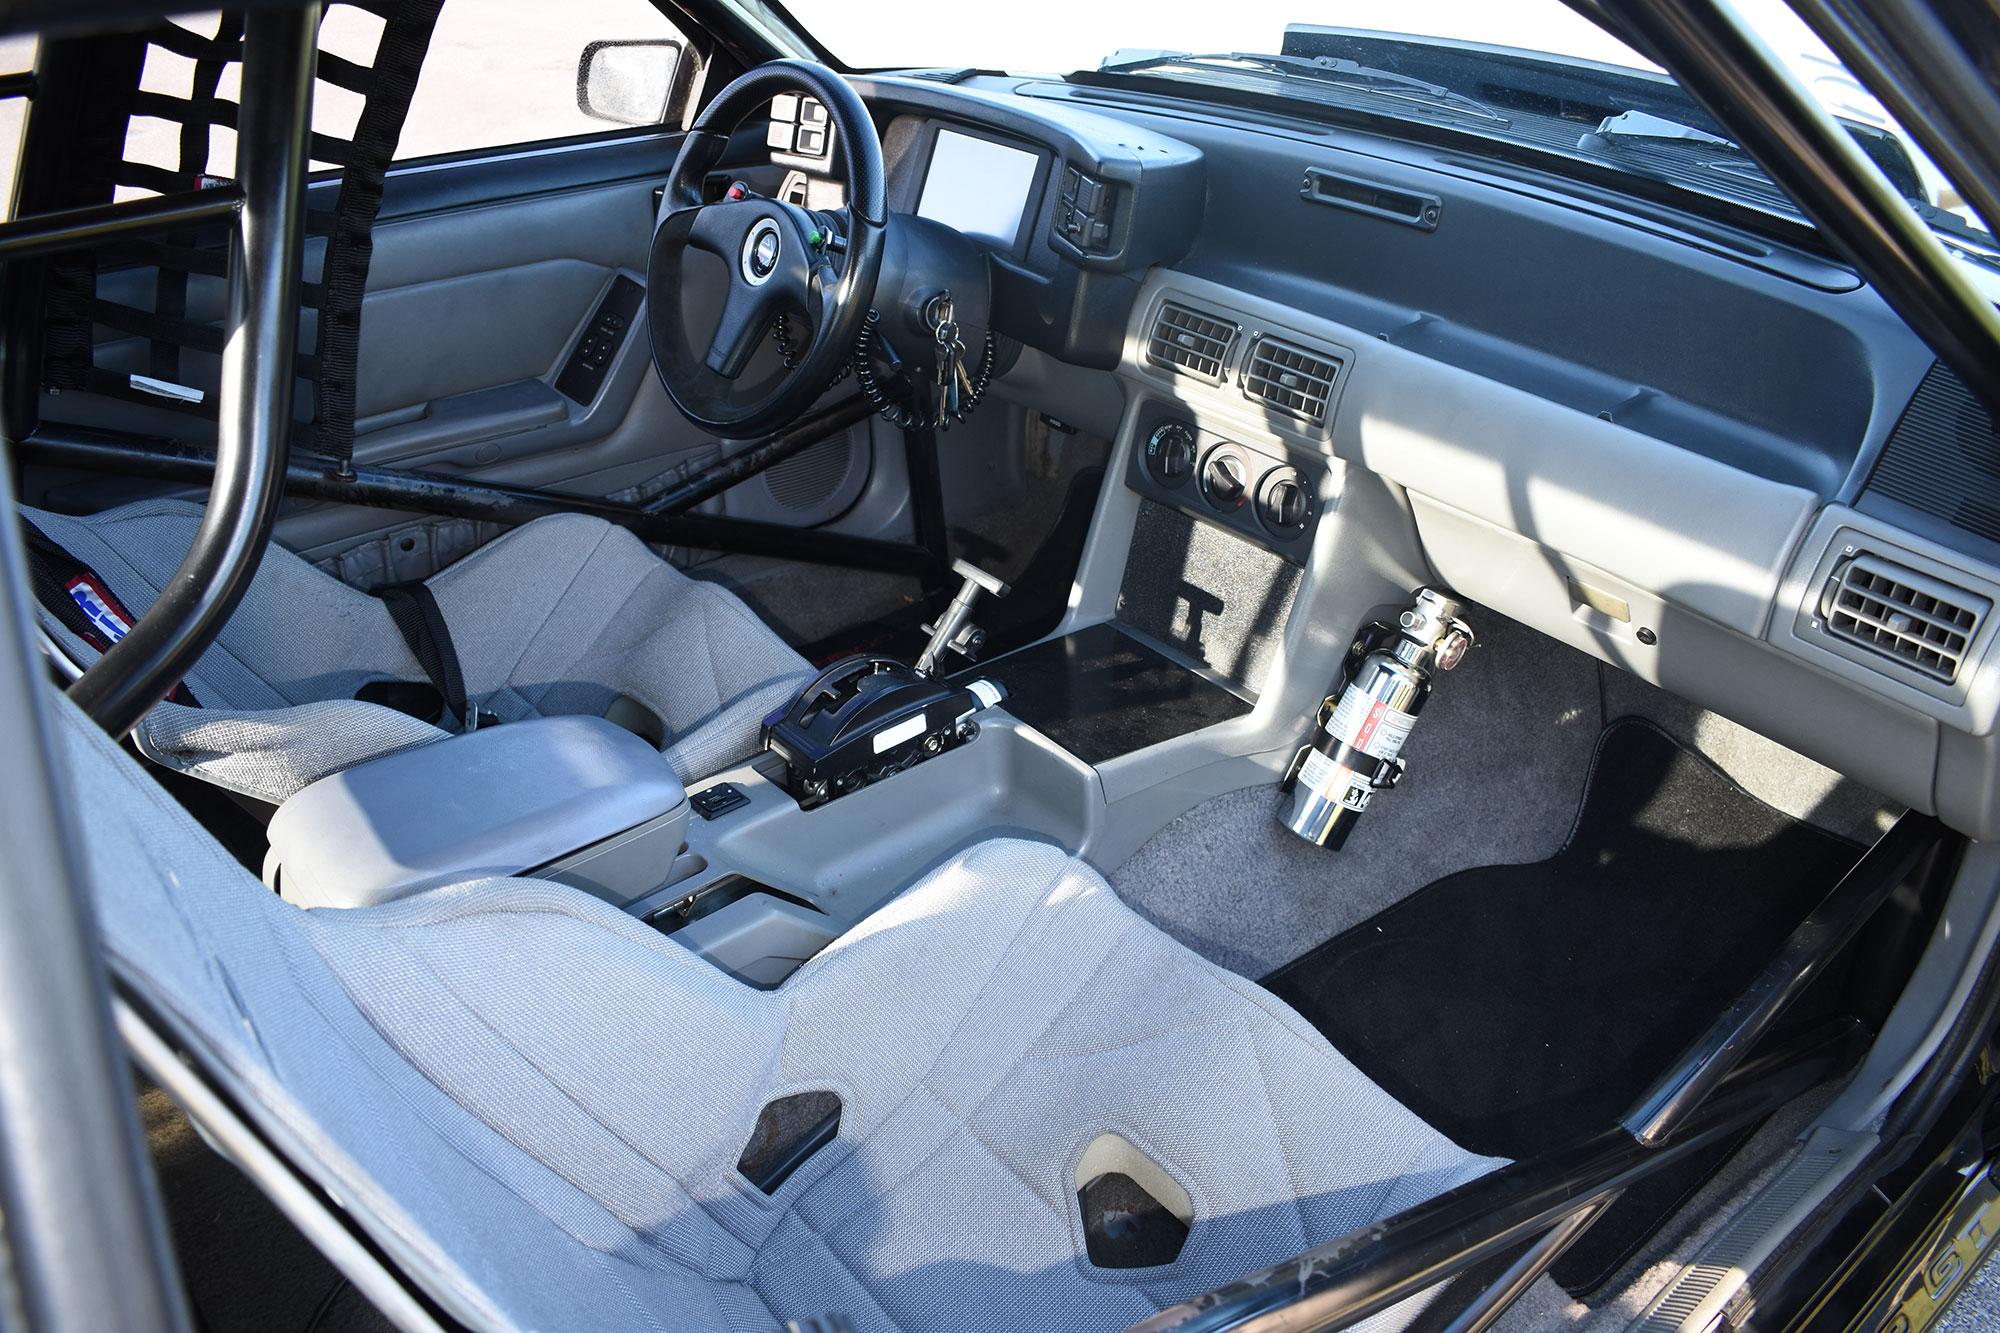 1988 Fox-body Mustang race car interior